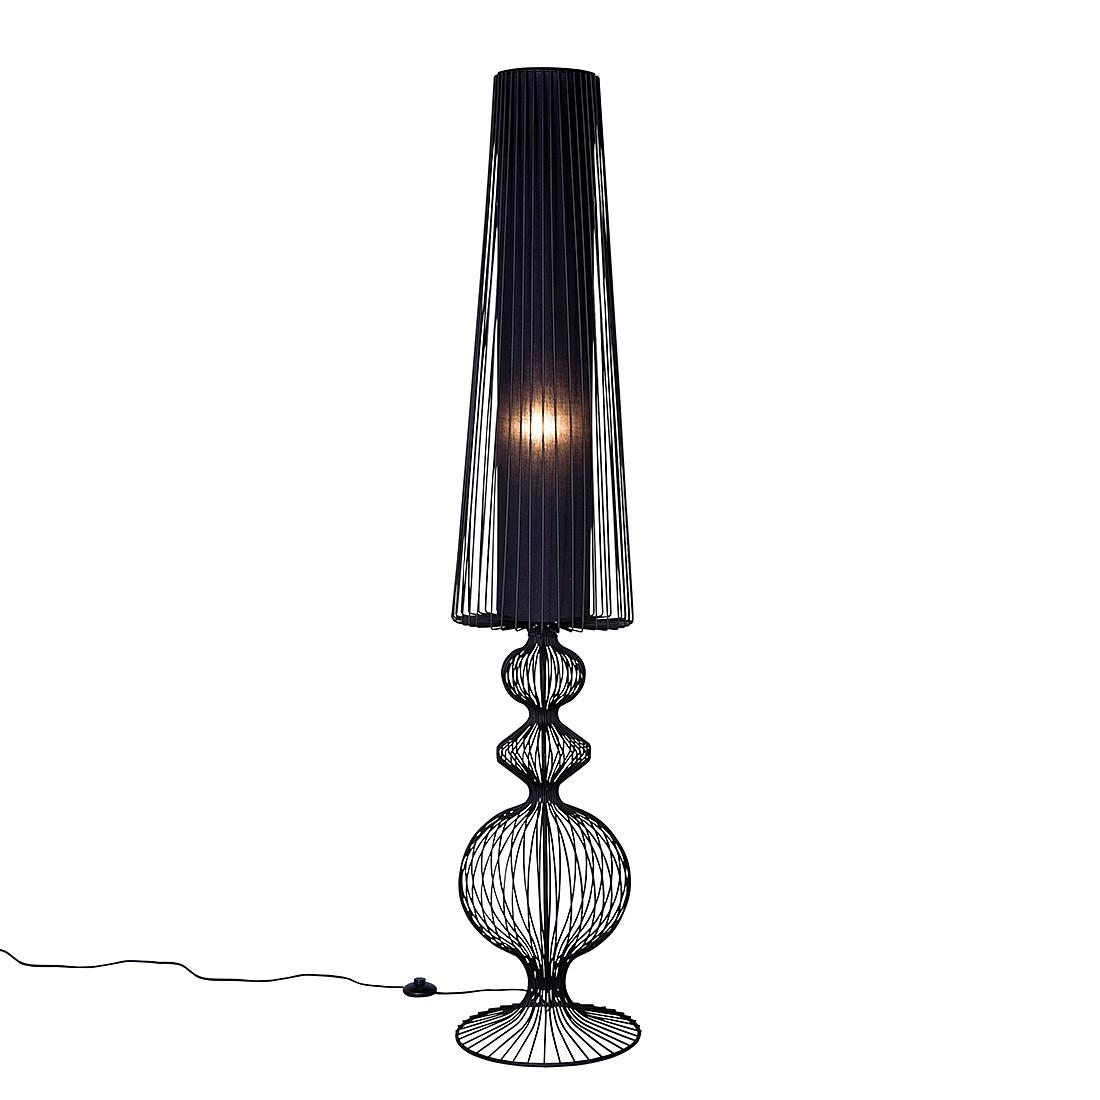 EEK A++, Lampadaire Swing Iron Uno - Fer noir, Kare Design